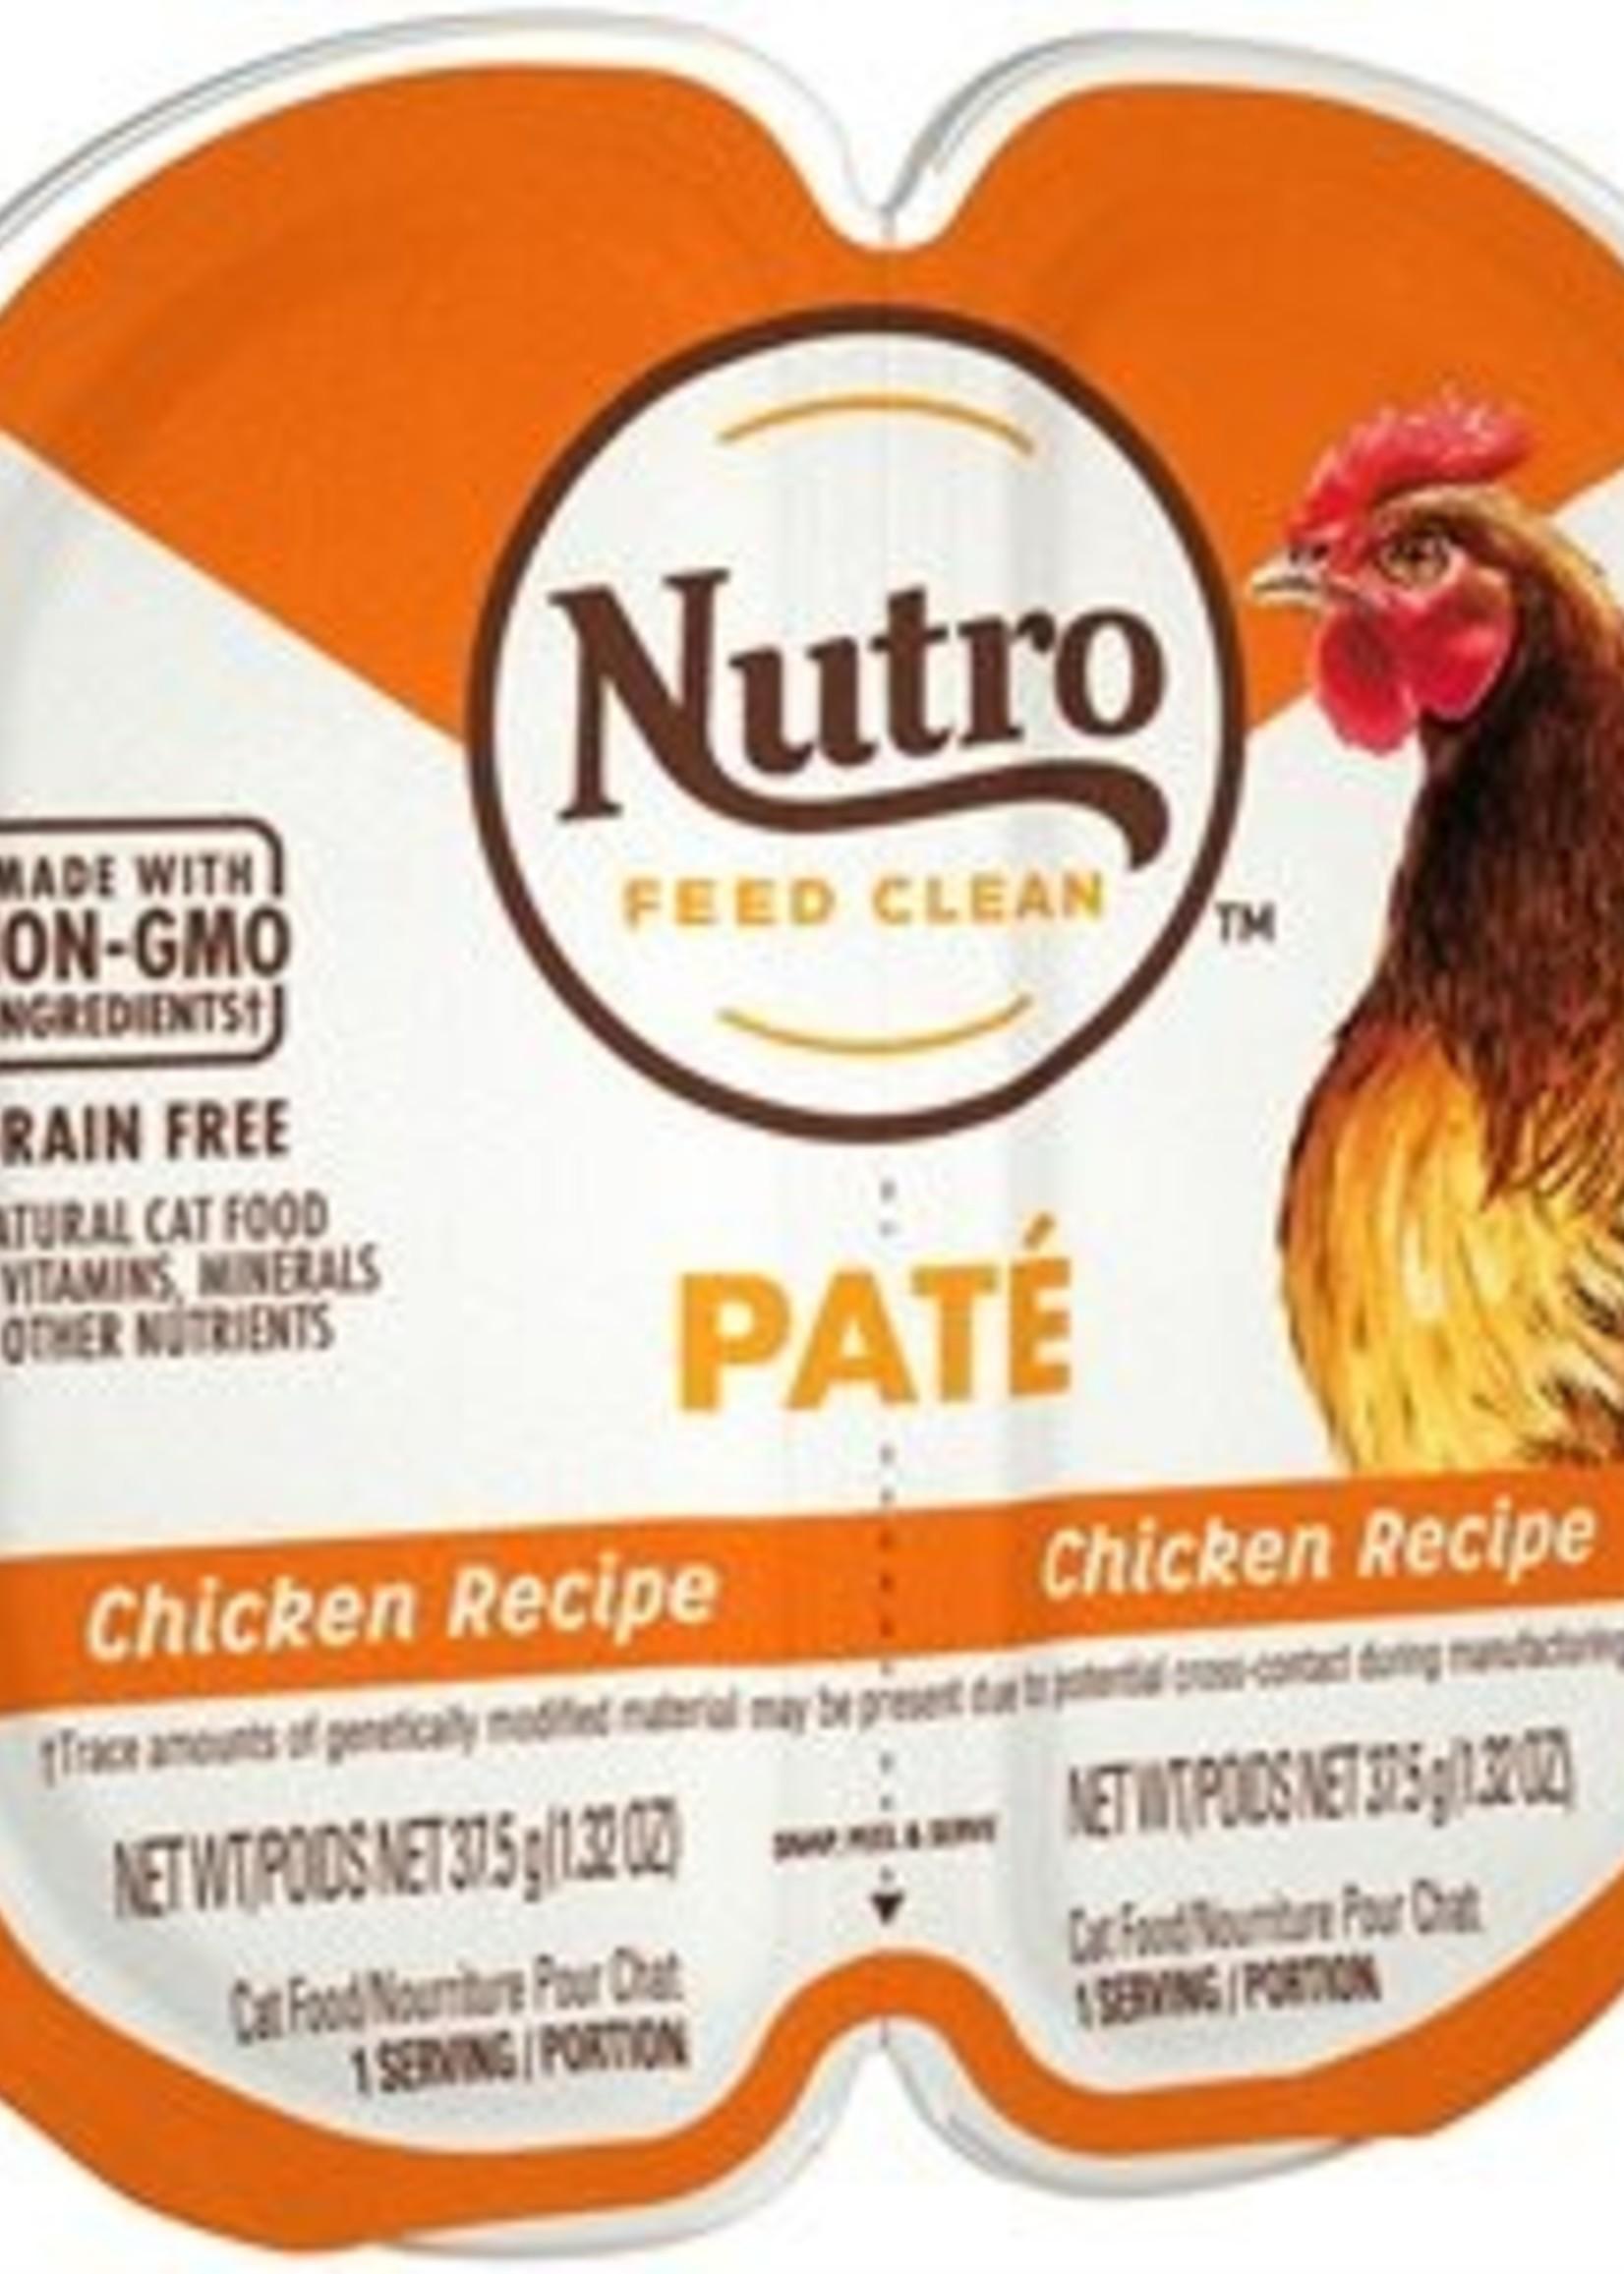 Nutro™ NUTRO PERFECT PORTIONS GRAIN FREE CHICKEN PATE 1.32oz